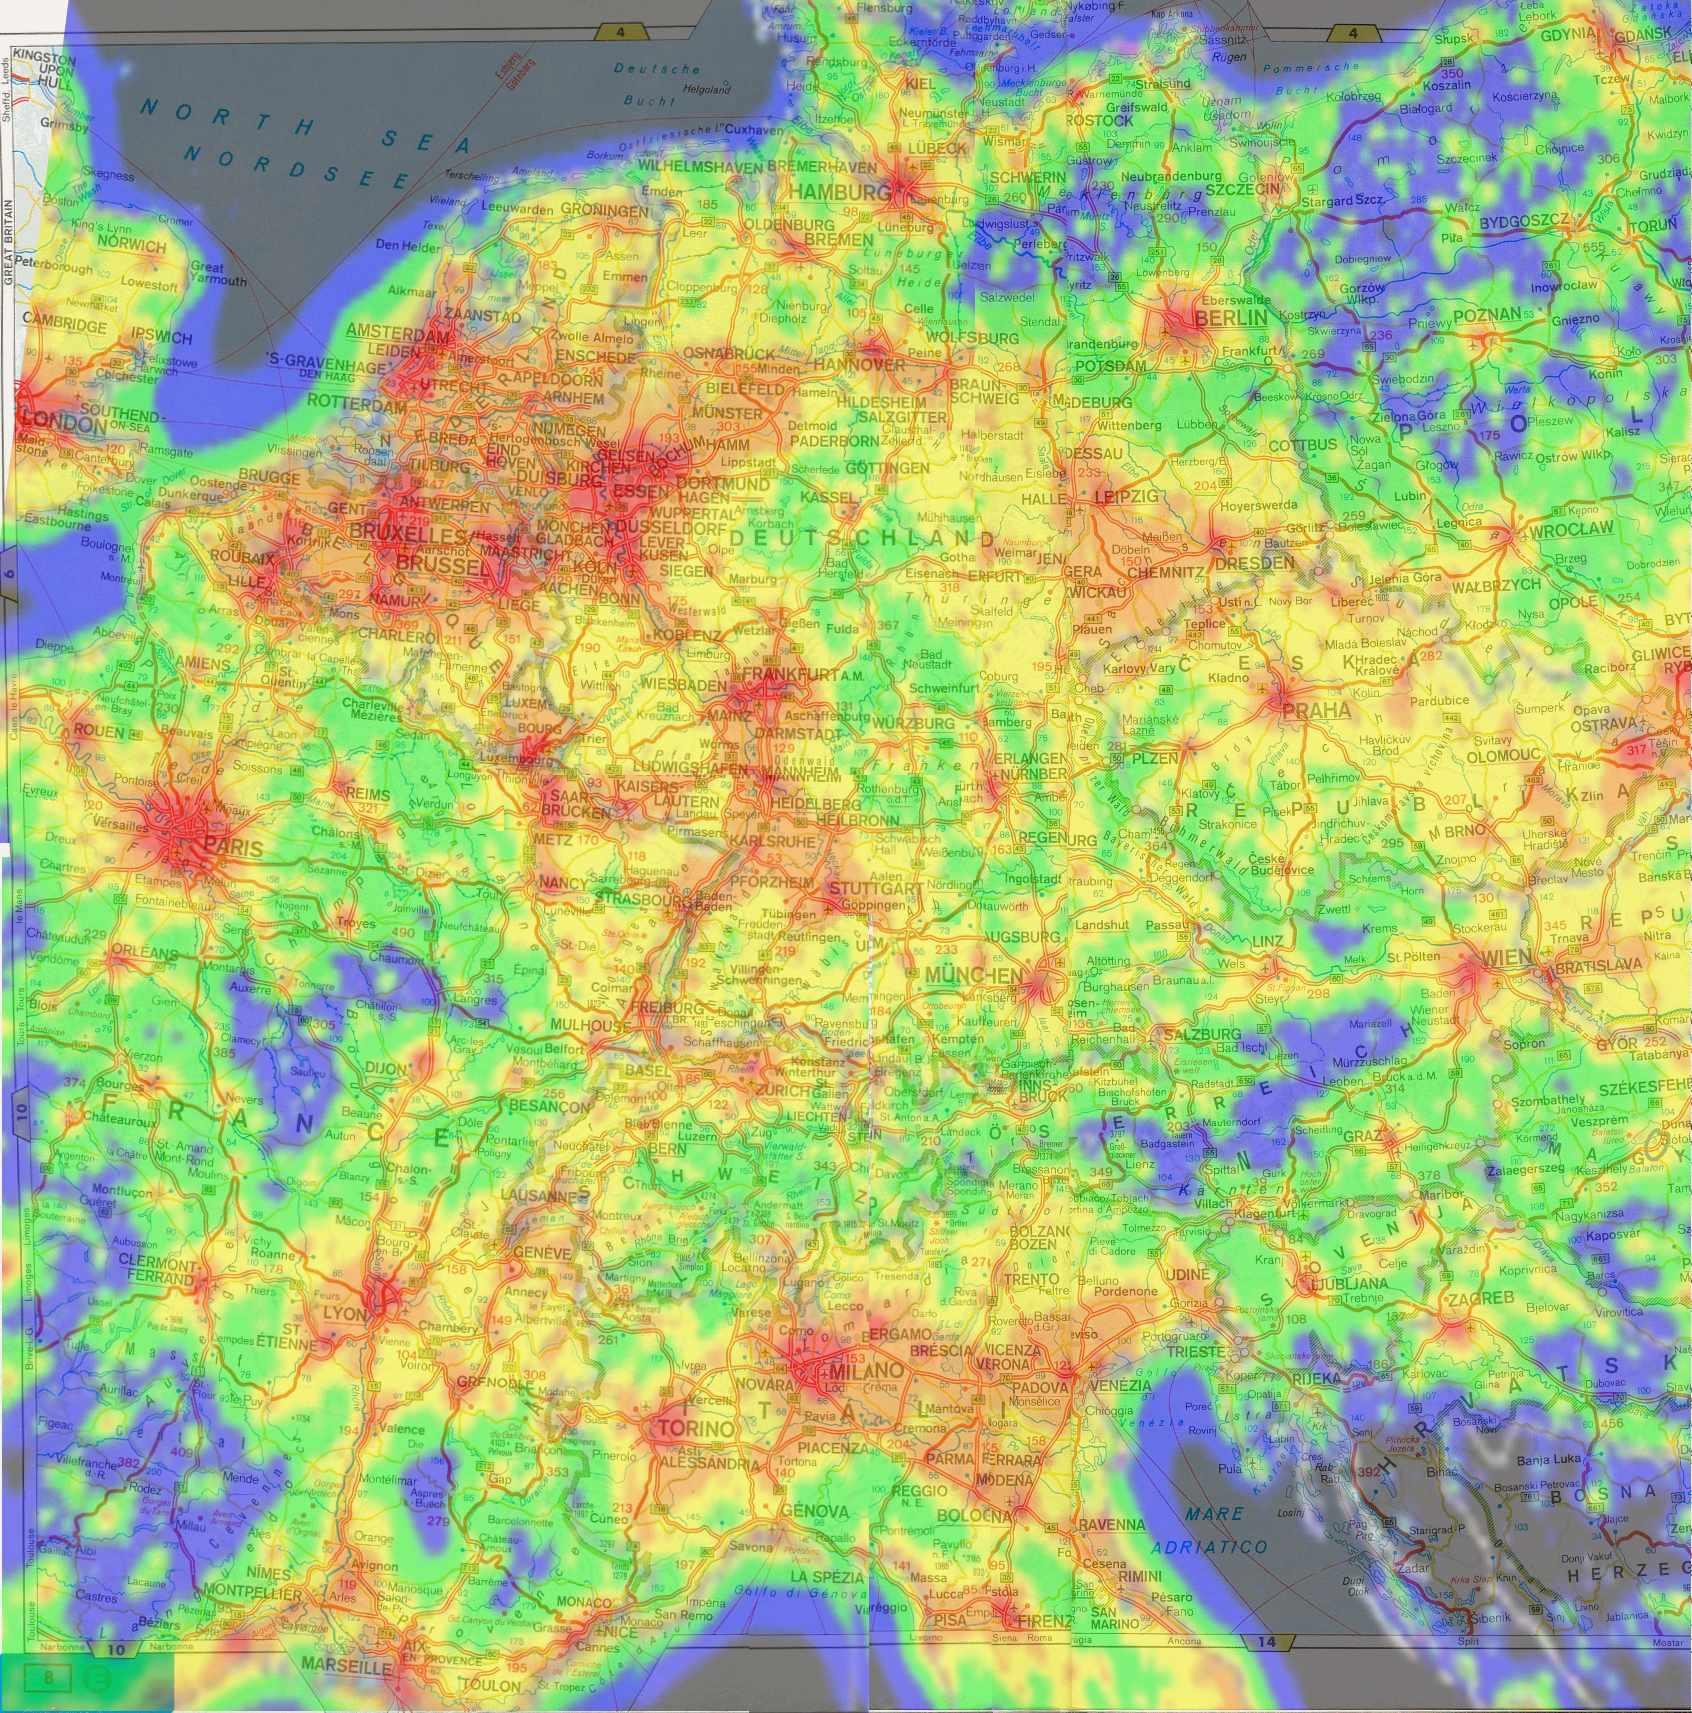 Lichtverschmutzung Karte 2019.Beobachten Abseits Der Lichtverschutzung